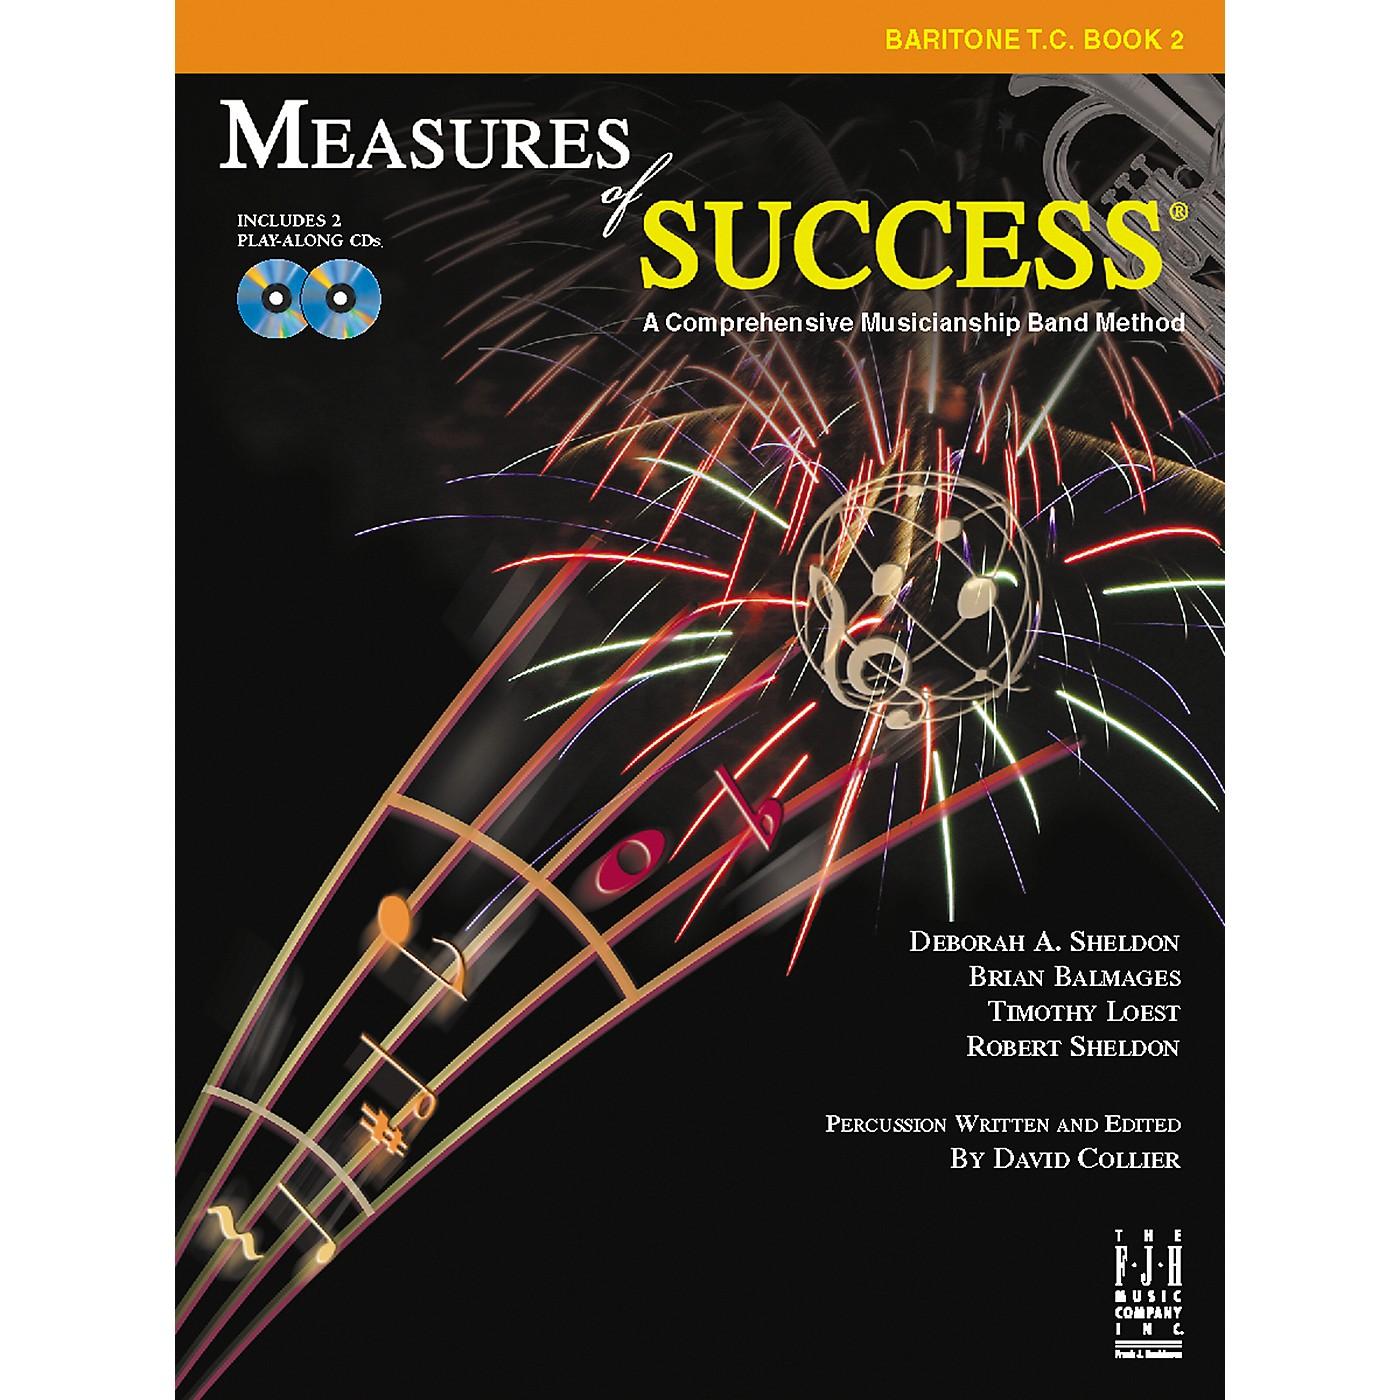 FJH Music Measures of Success Baritone T.C. Book 2 thumbnail